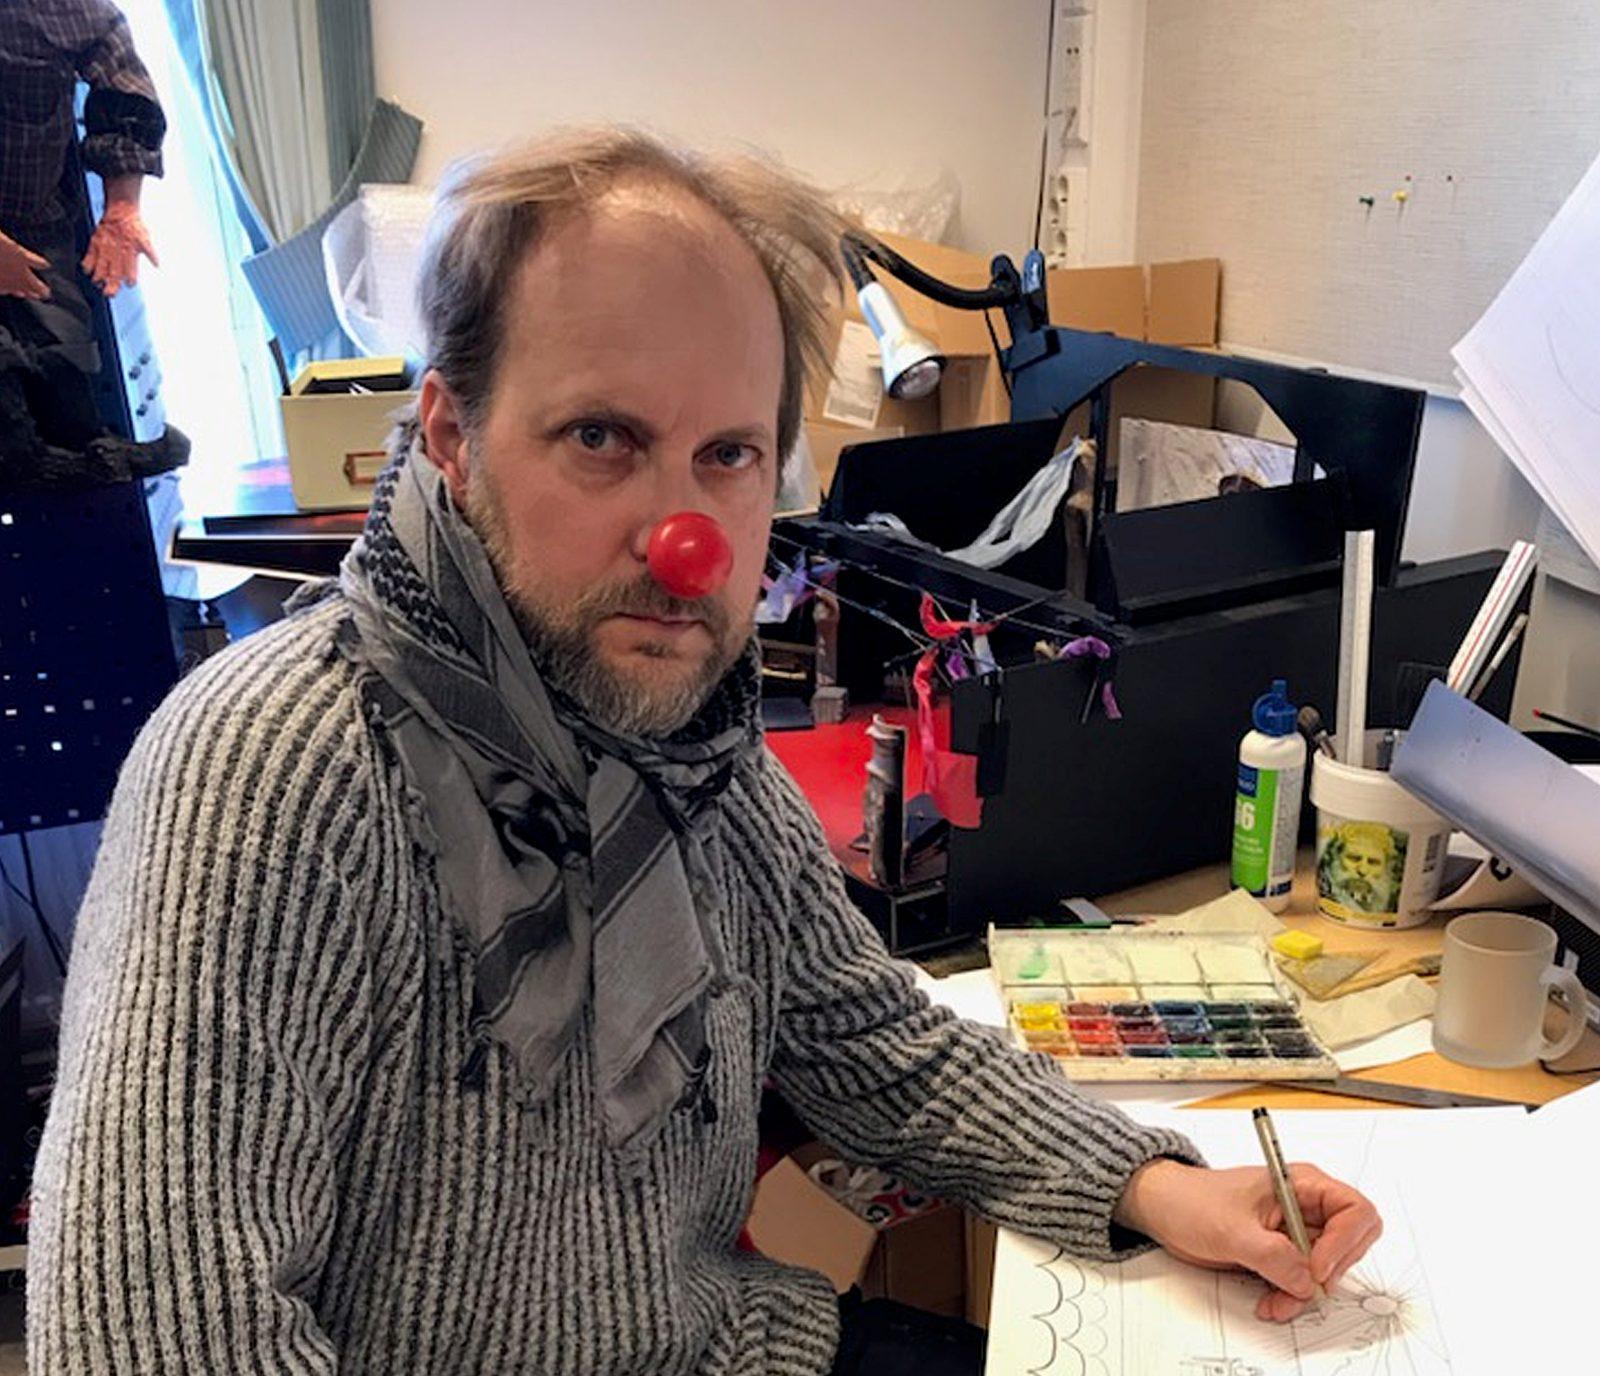 Lavastaja Markku Hernetkoski